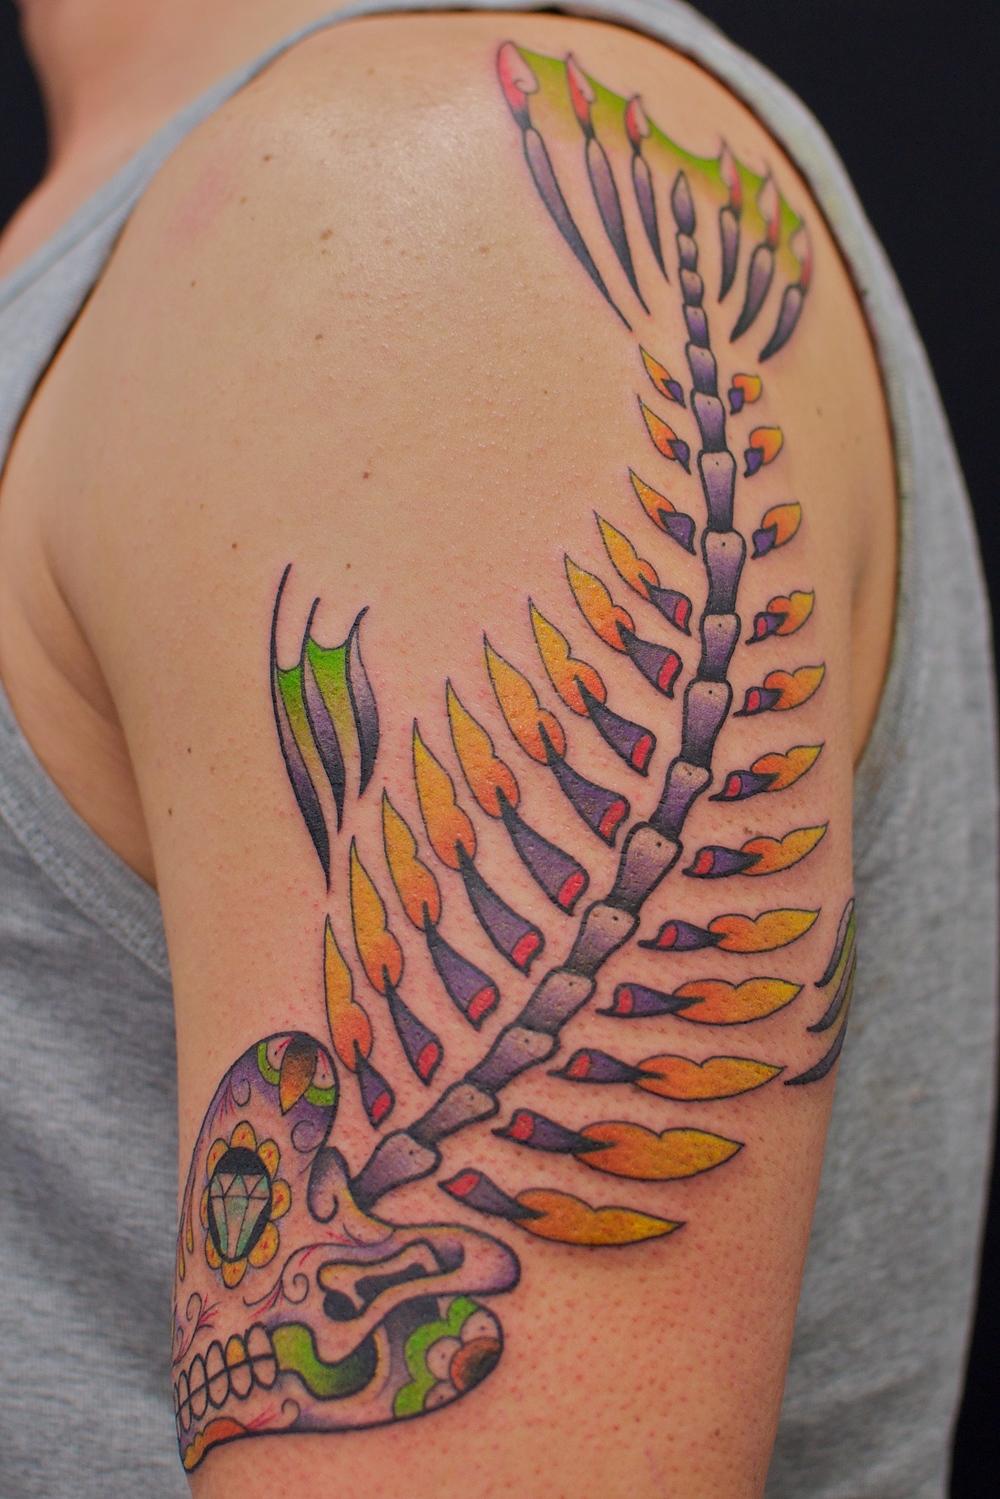 01052013 Tattoos 09 26.jpg